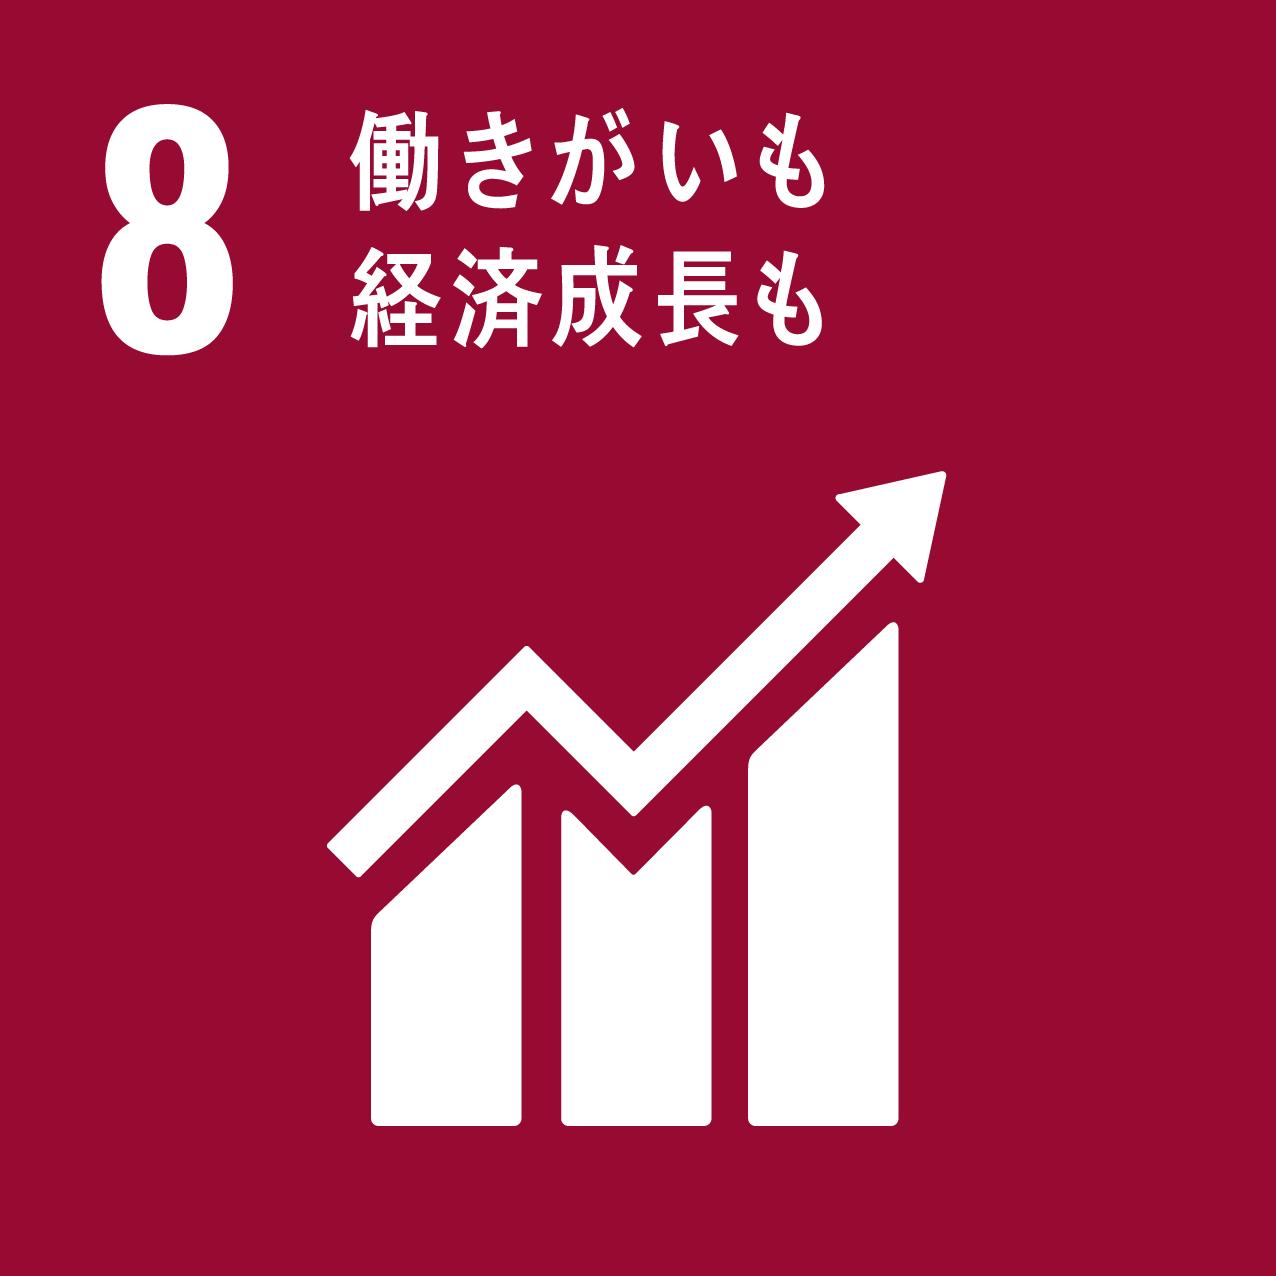 SDGs 8.働きがいも経済成長も